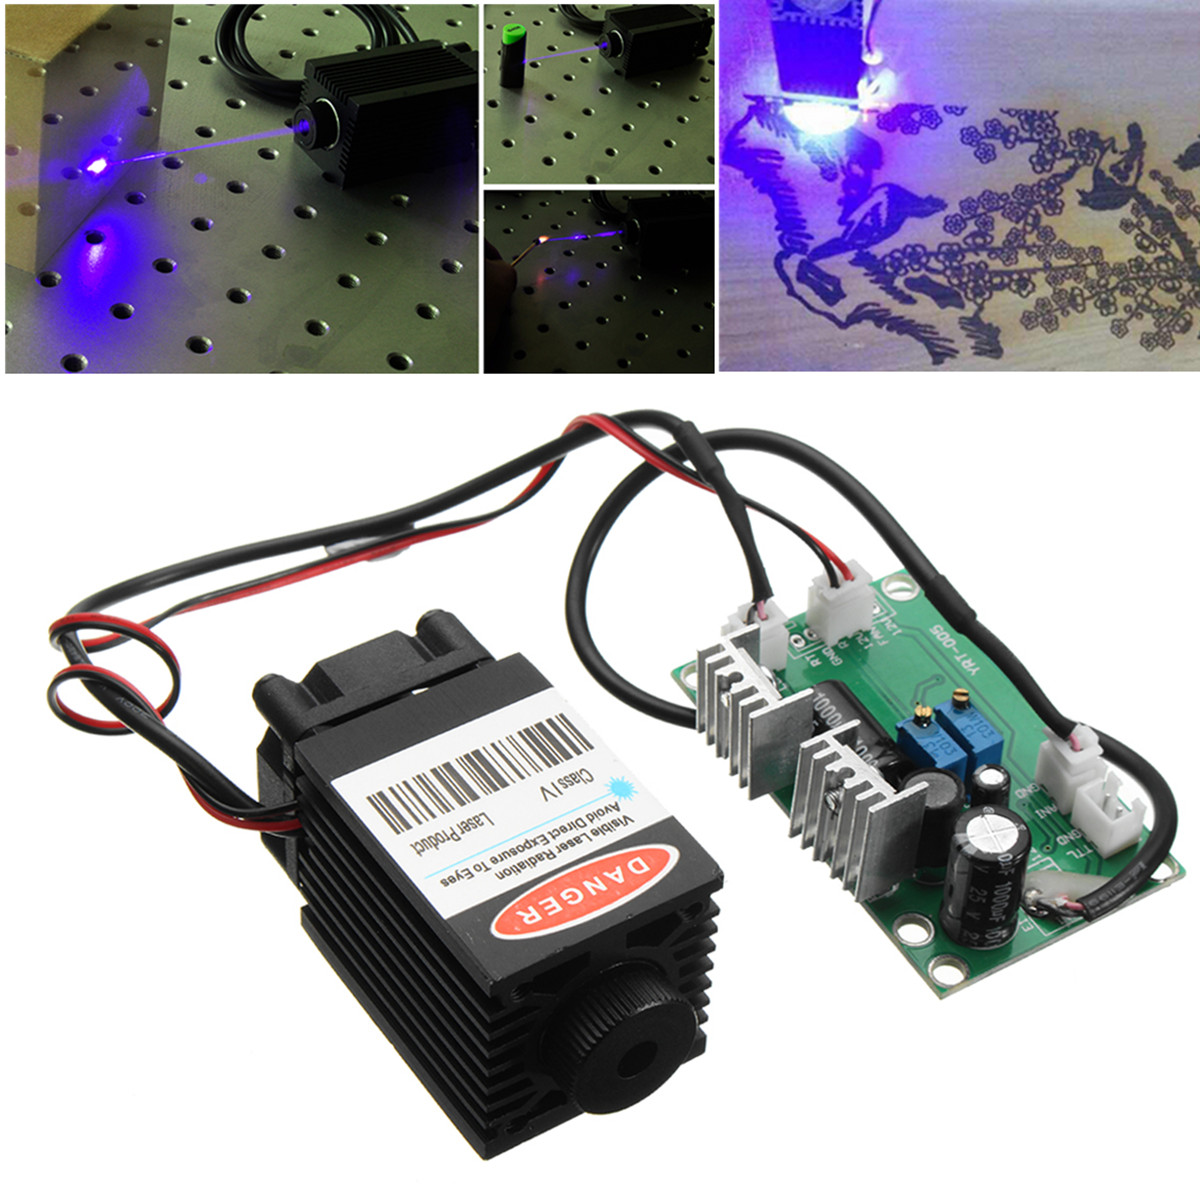 445nm/450nm 1600MW high power focusing blue laser module laser engraving cutting TTL module for DIY Laser Engraver